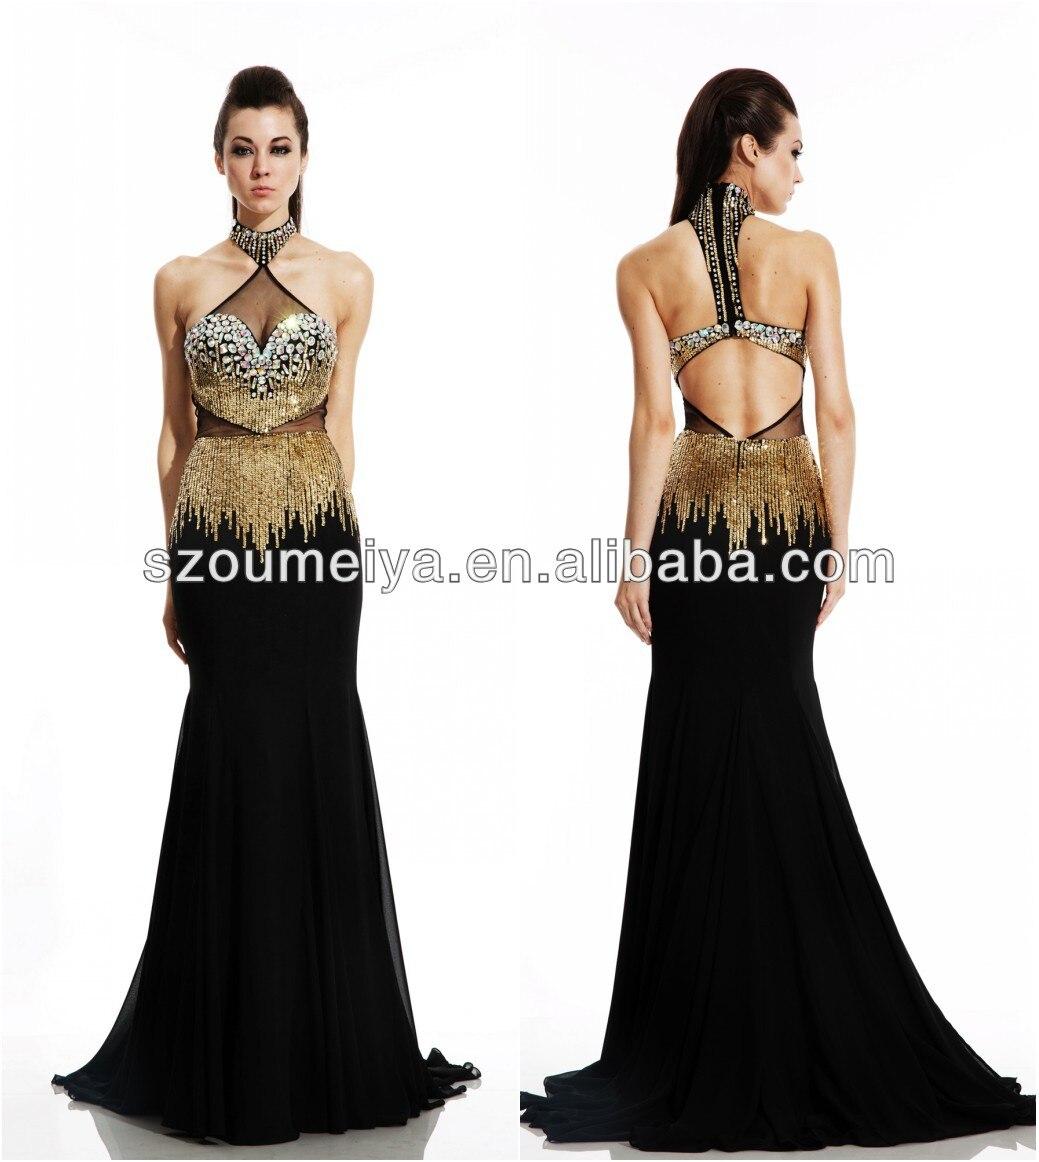 Online Get Cheap Black and Gold 2016 Prom Dress -Aliexpress.com ...